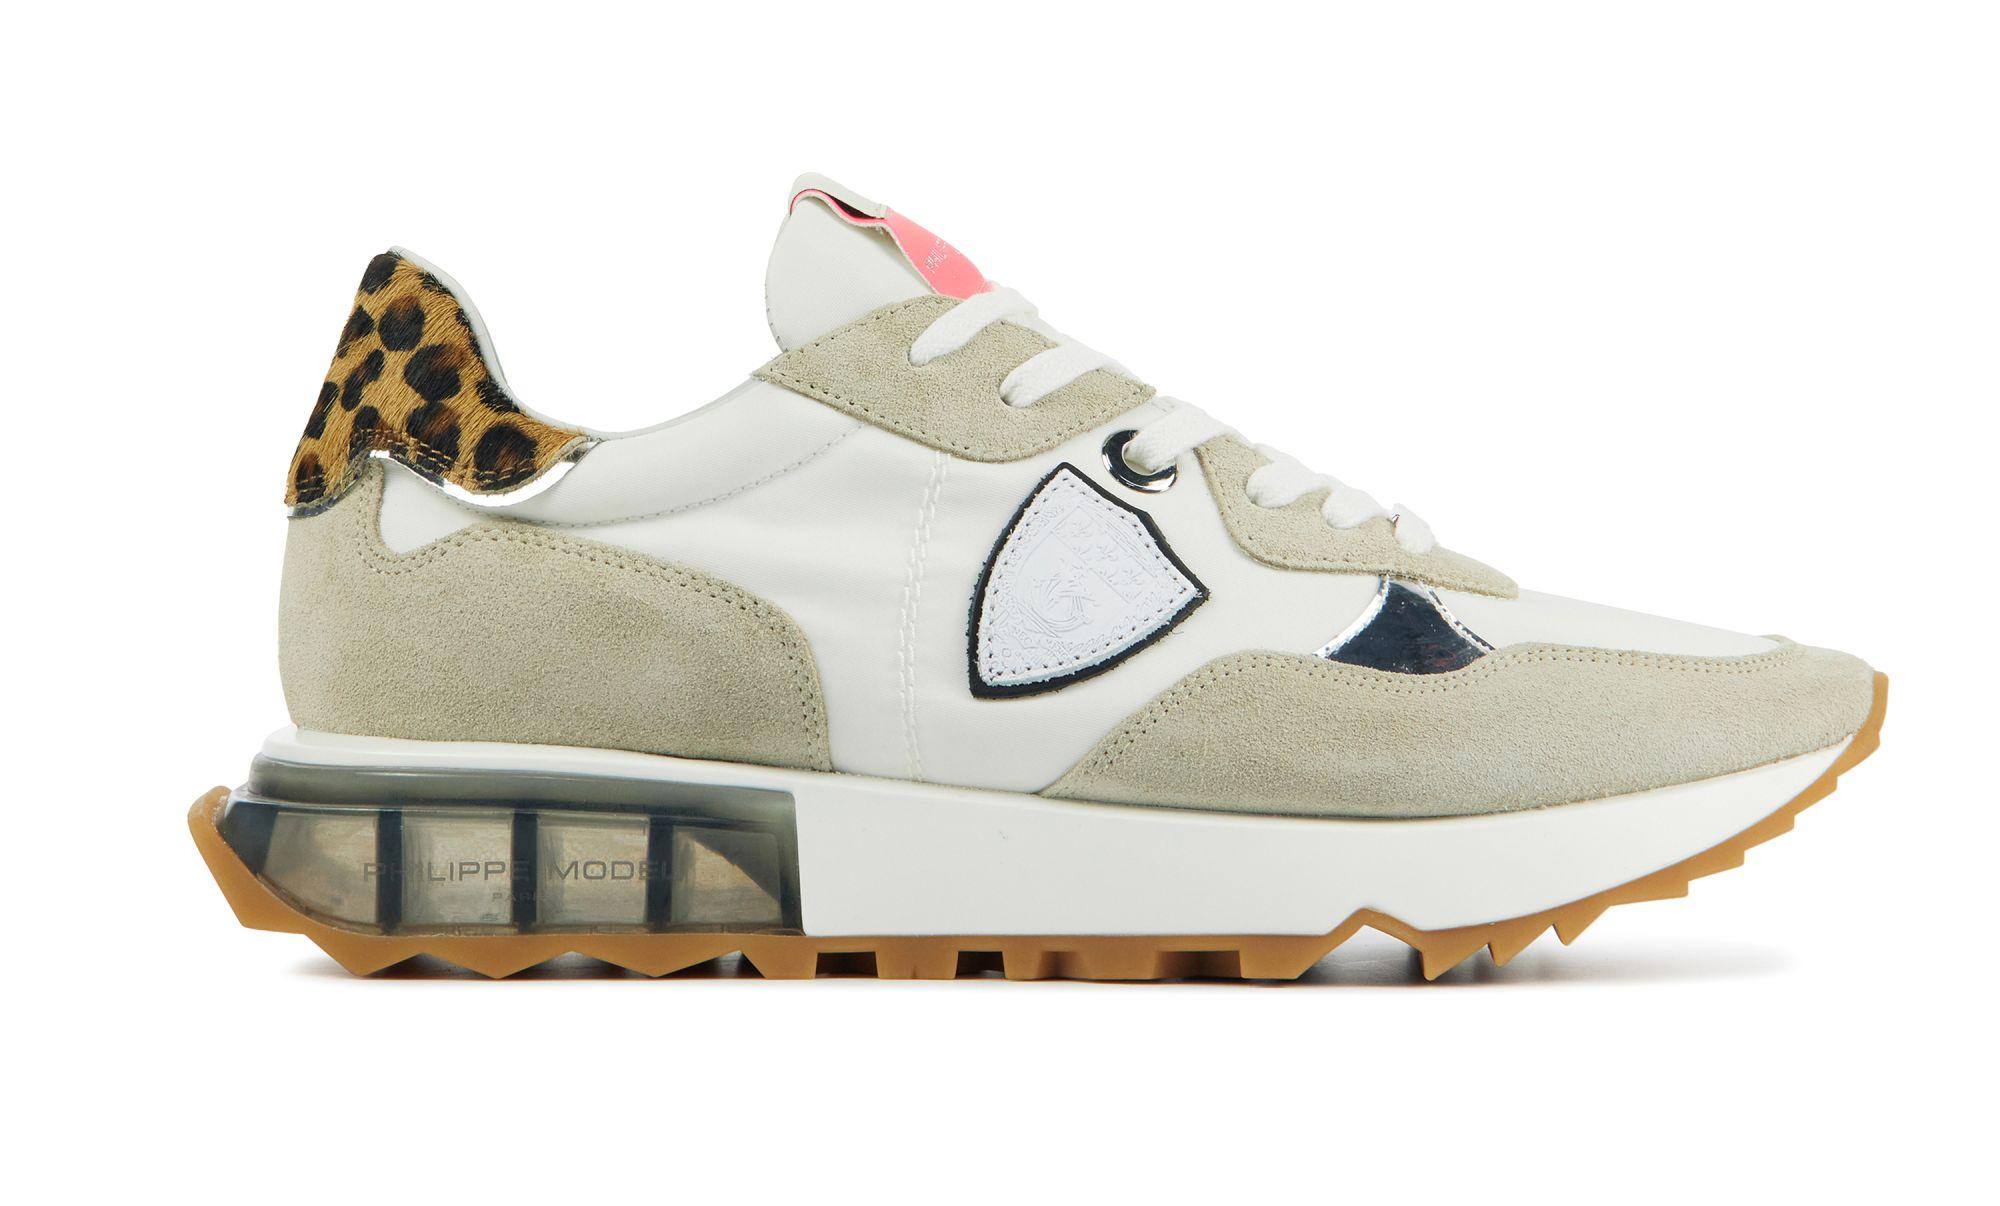 Philippe Model Dames Leren SneakersSneakers